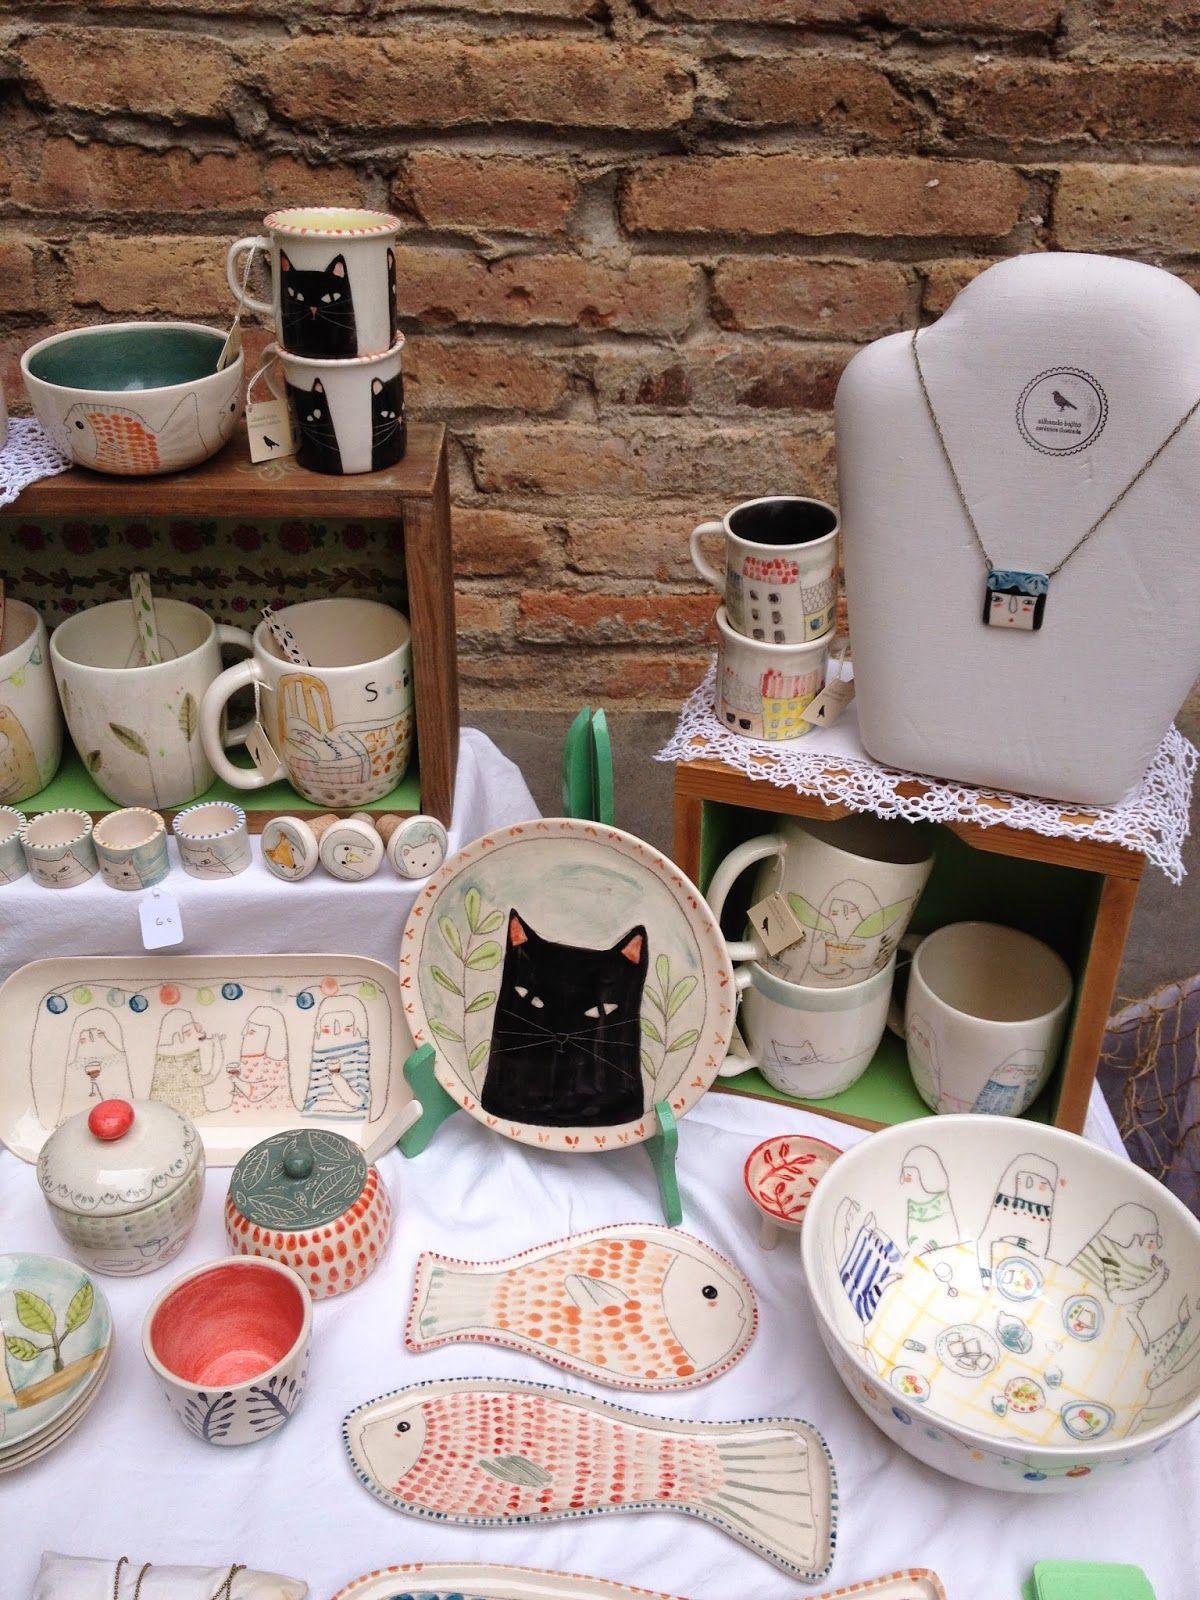 Silbando bajito cerámicas: mayo 2014